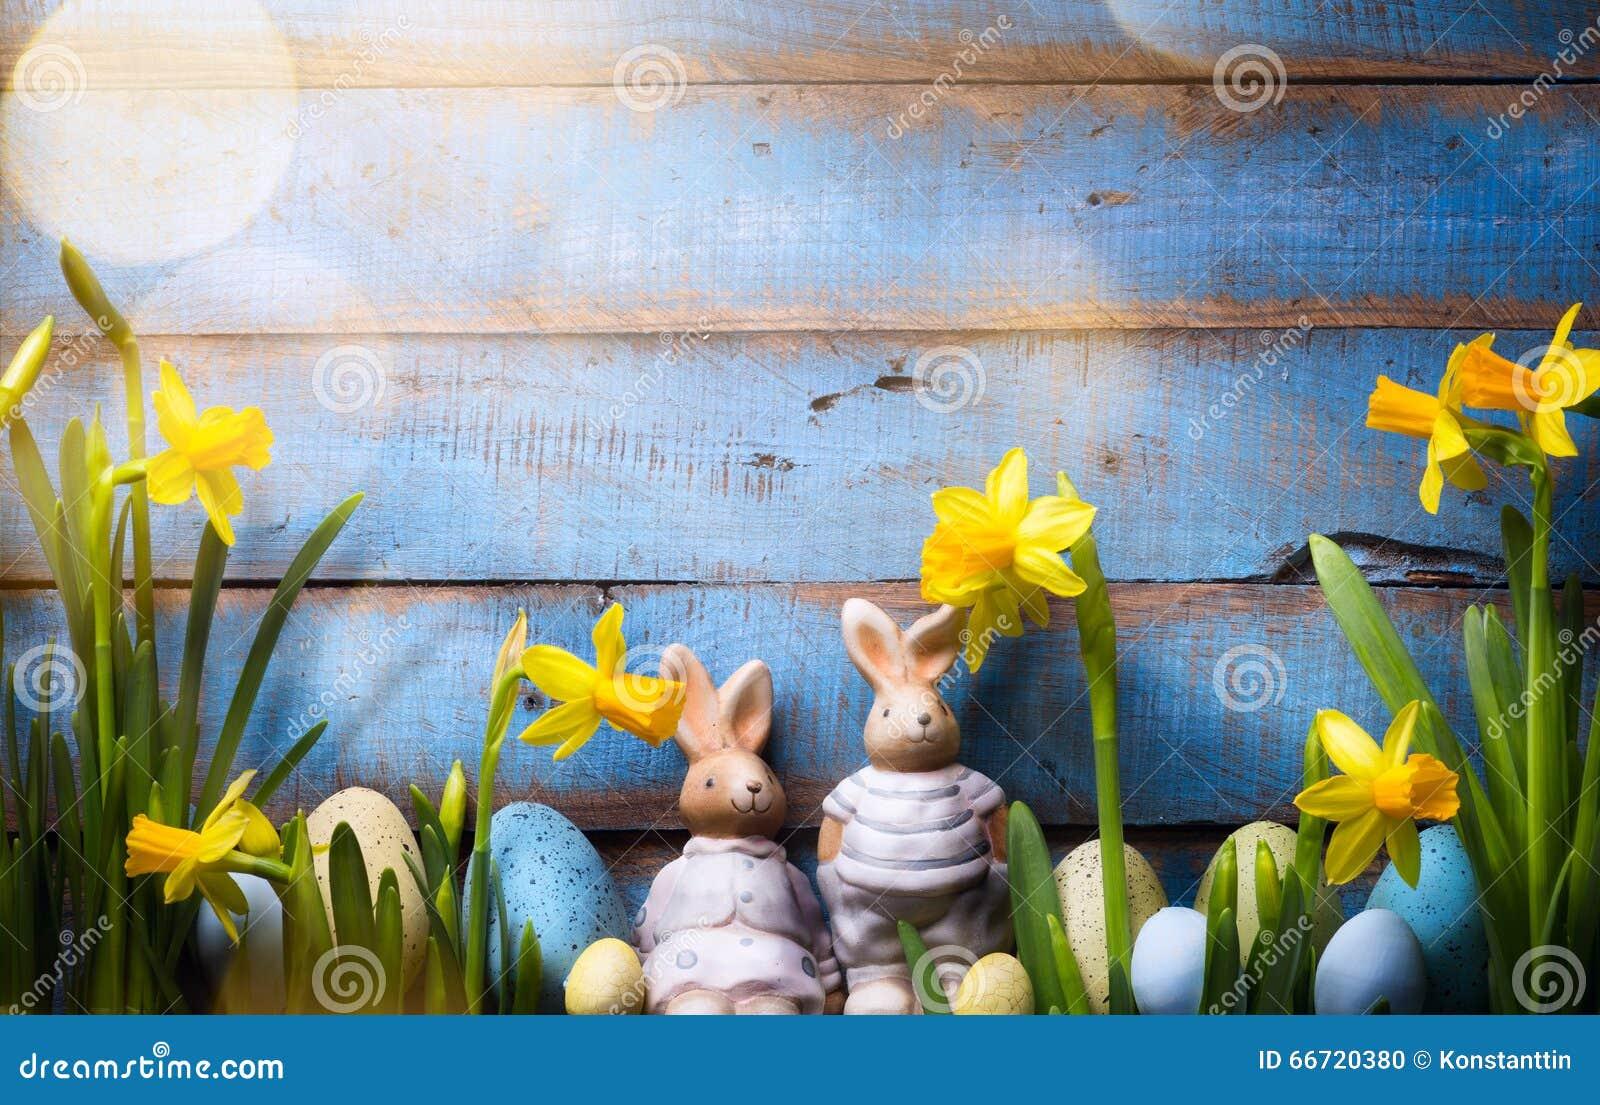 Art Happy Easter Day; Familie Osterhase und Ostereier